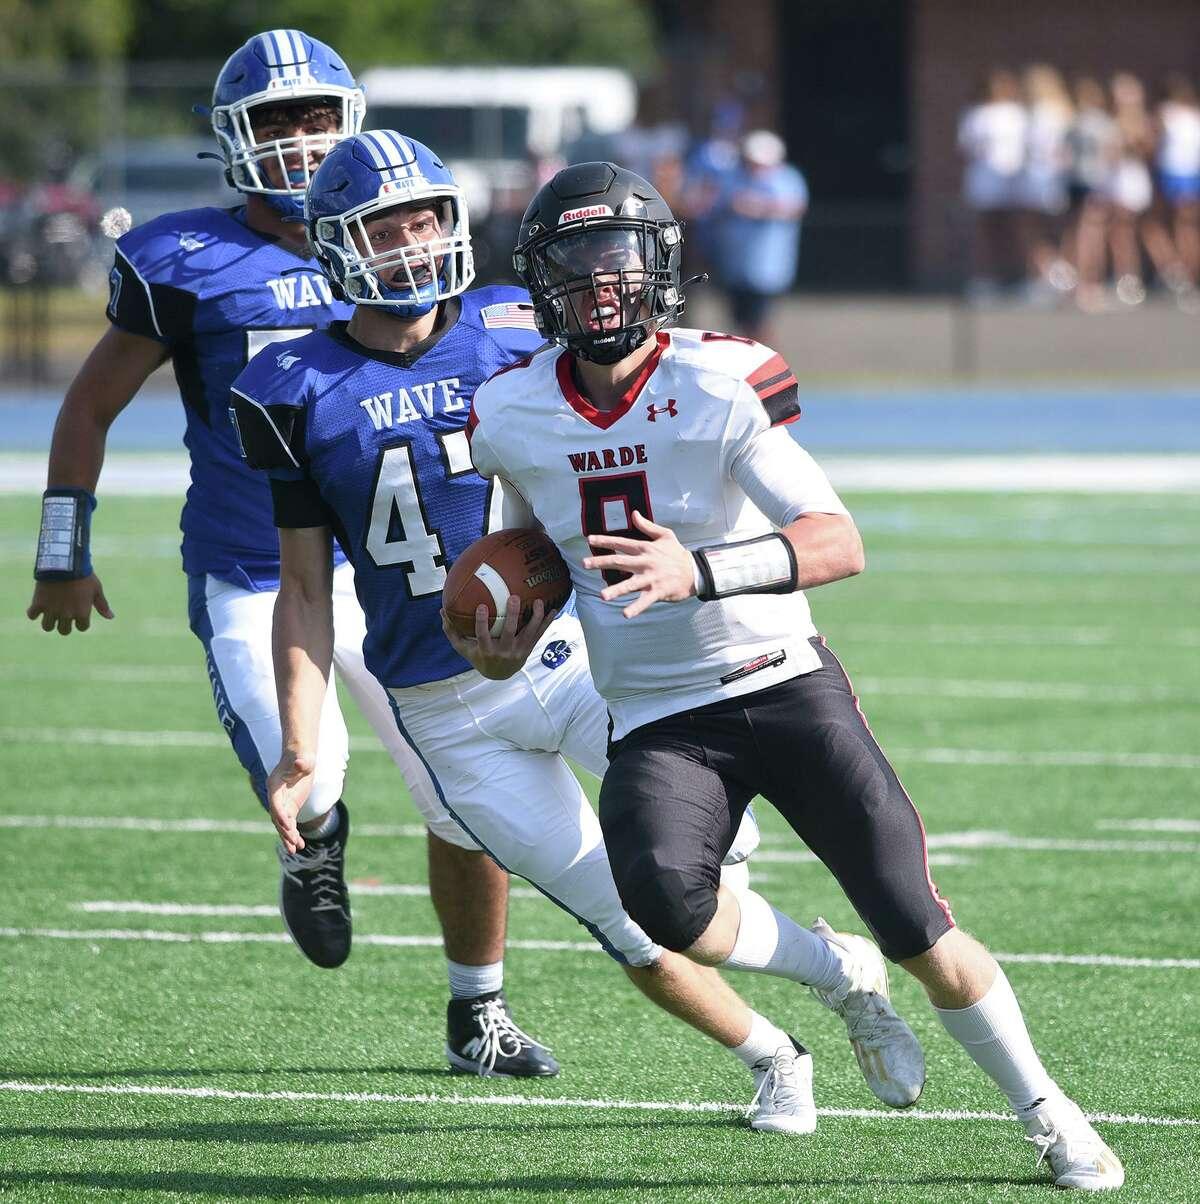 Warde quarterback Charles Gulbin runs for some yards as Darien's Mason Hedley pursues on Saturday.